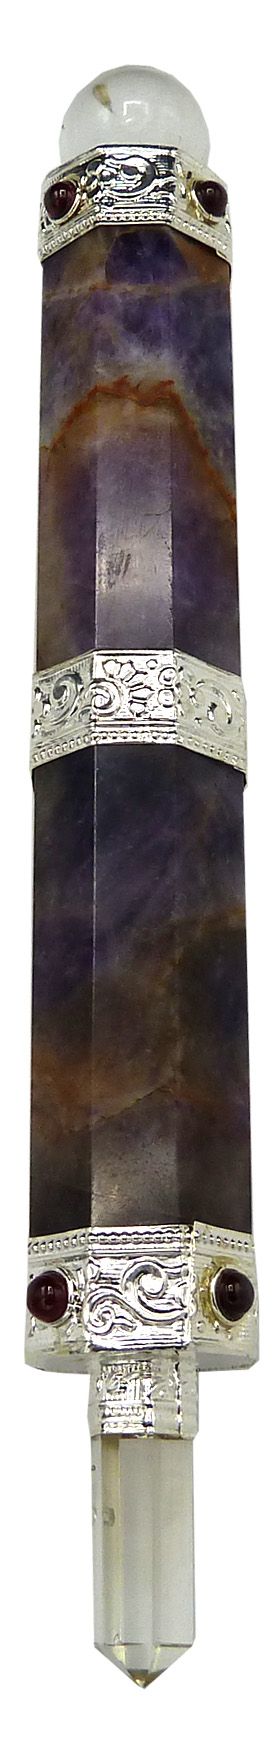 Bâton de soin Amethyste 15cm